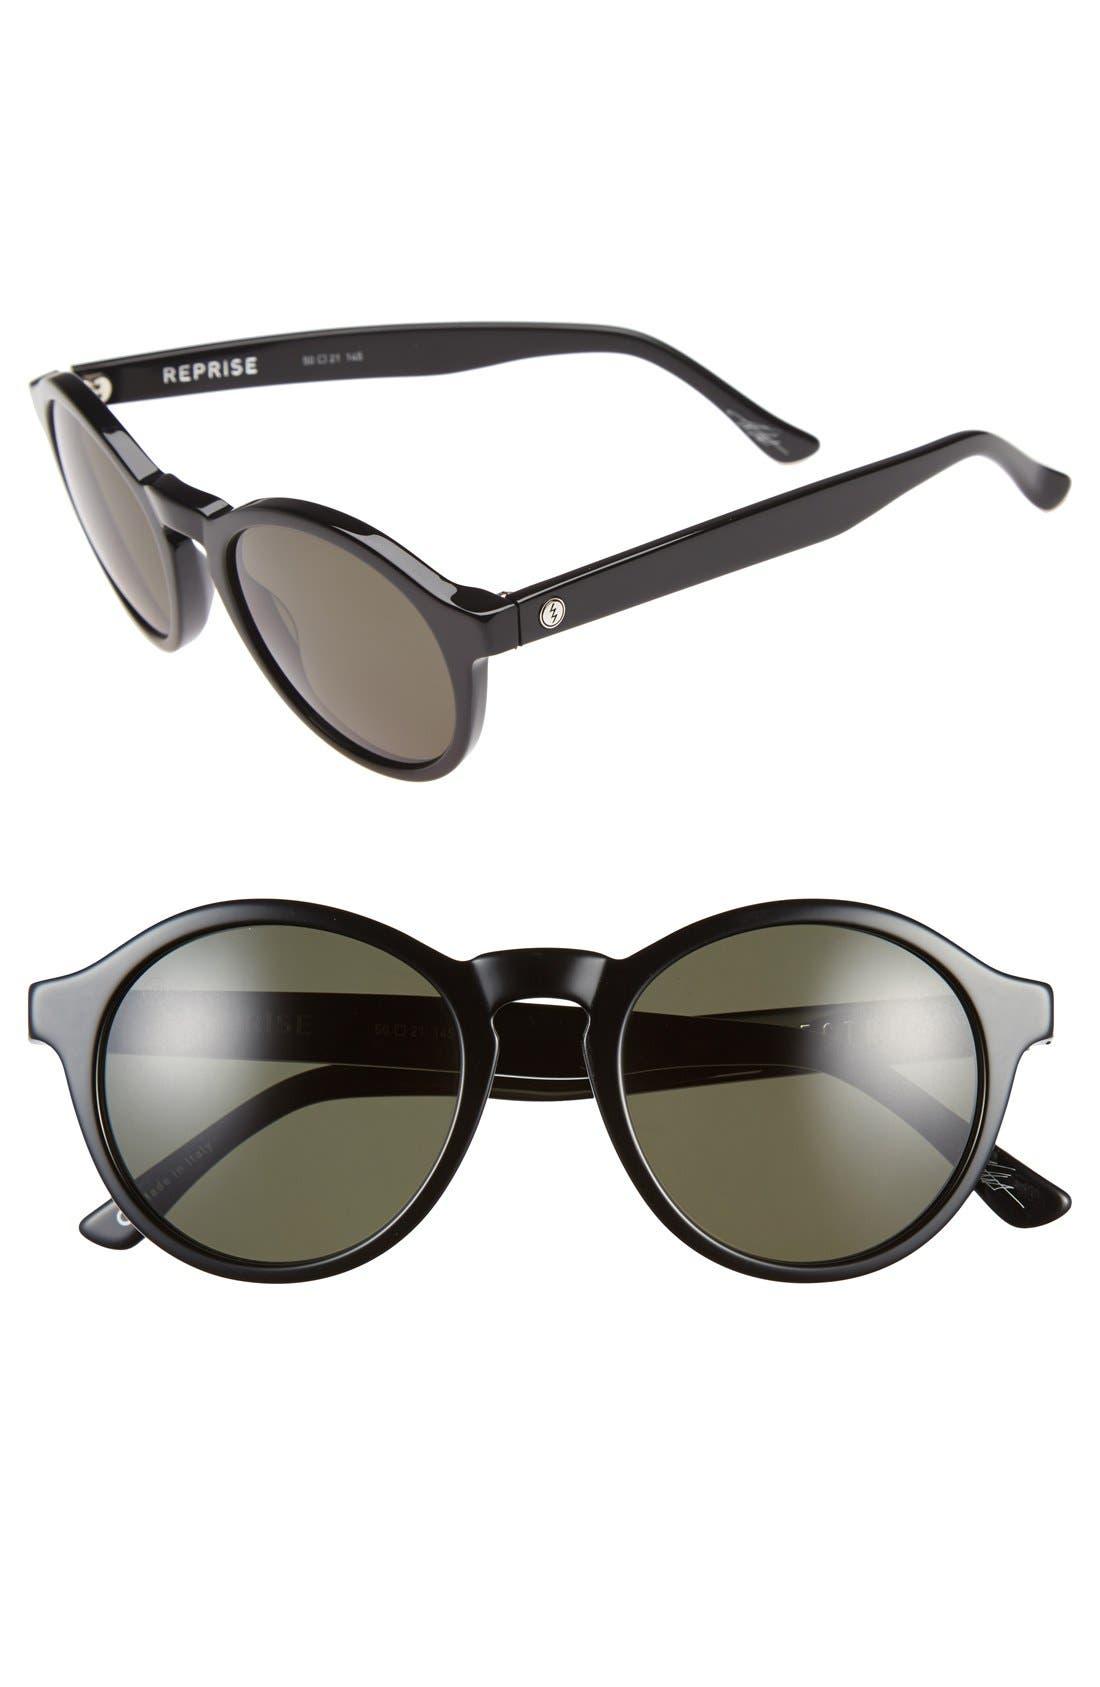 'Reprise' 50mm Round Sunglasses, Main, color, 001